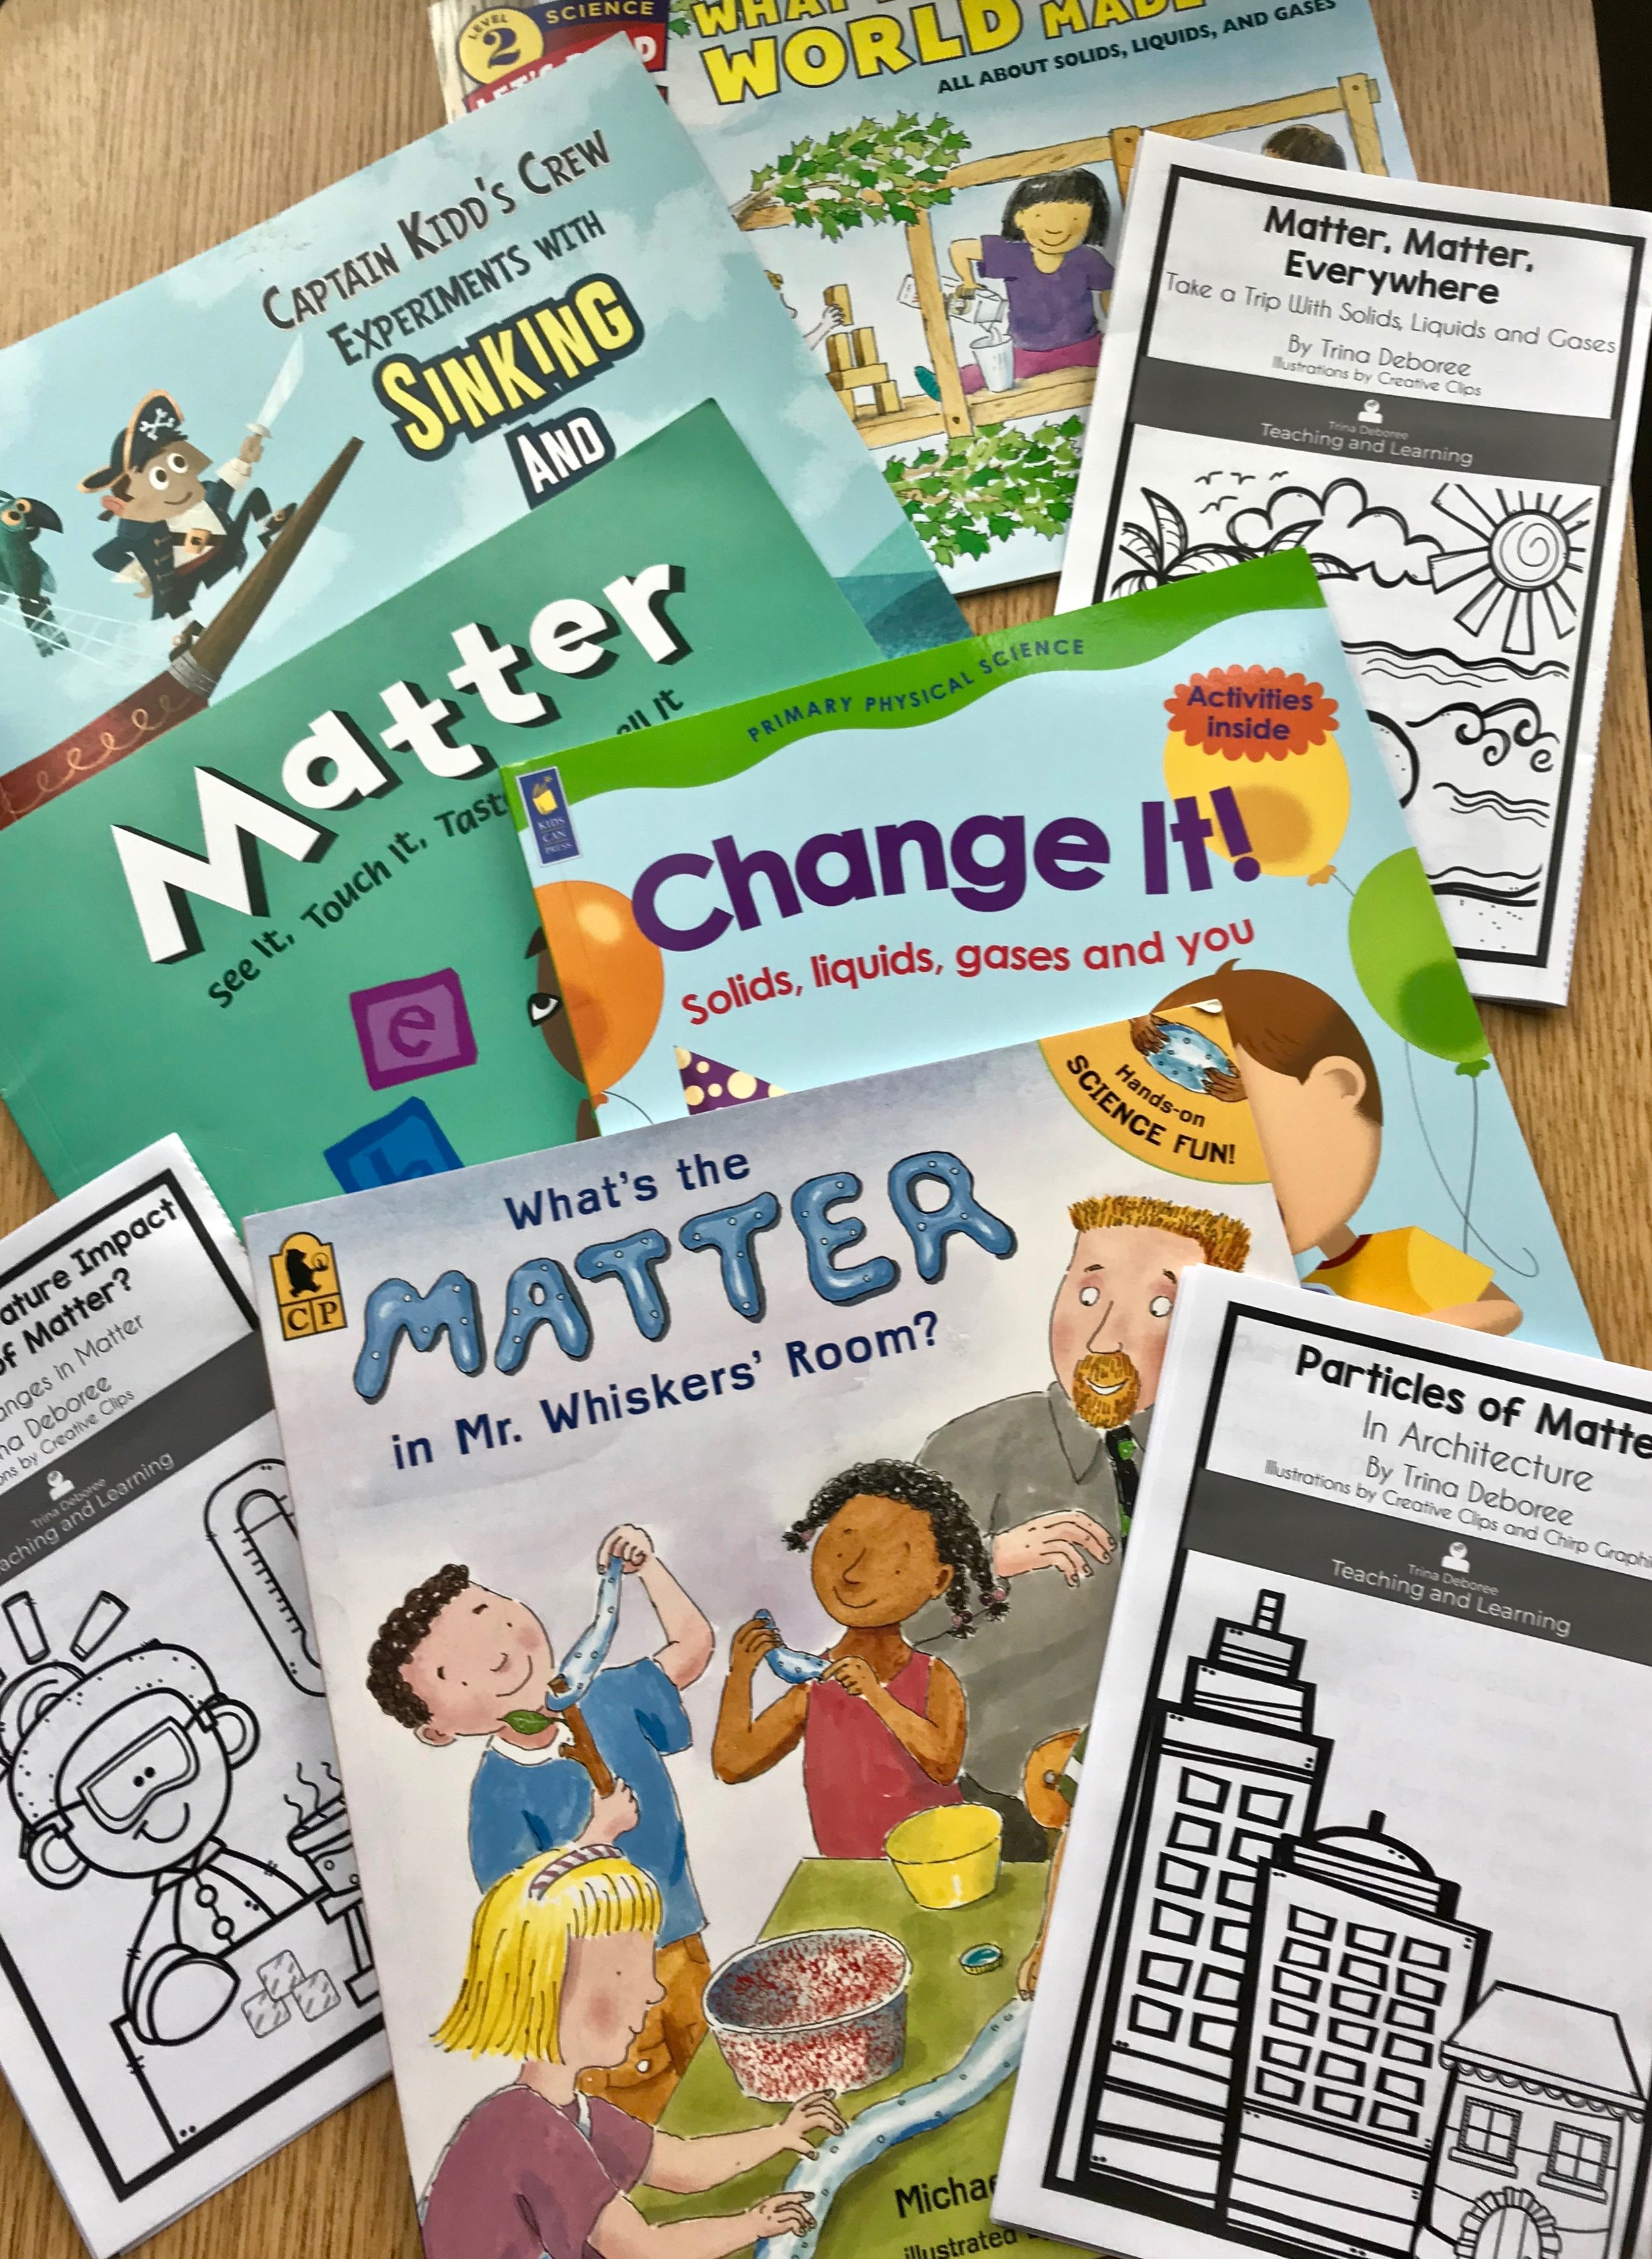 Books that teach matter (solids, liquids, and gases). #whatismatter #physicalsciencematter #matterbooks #solids,liquids,gasesliterature